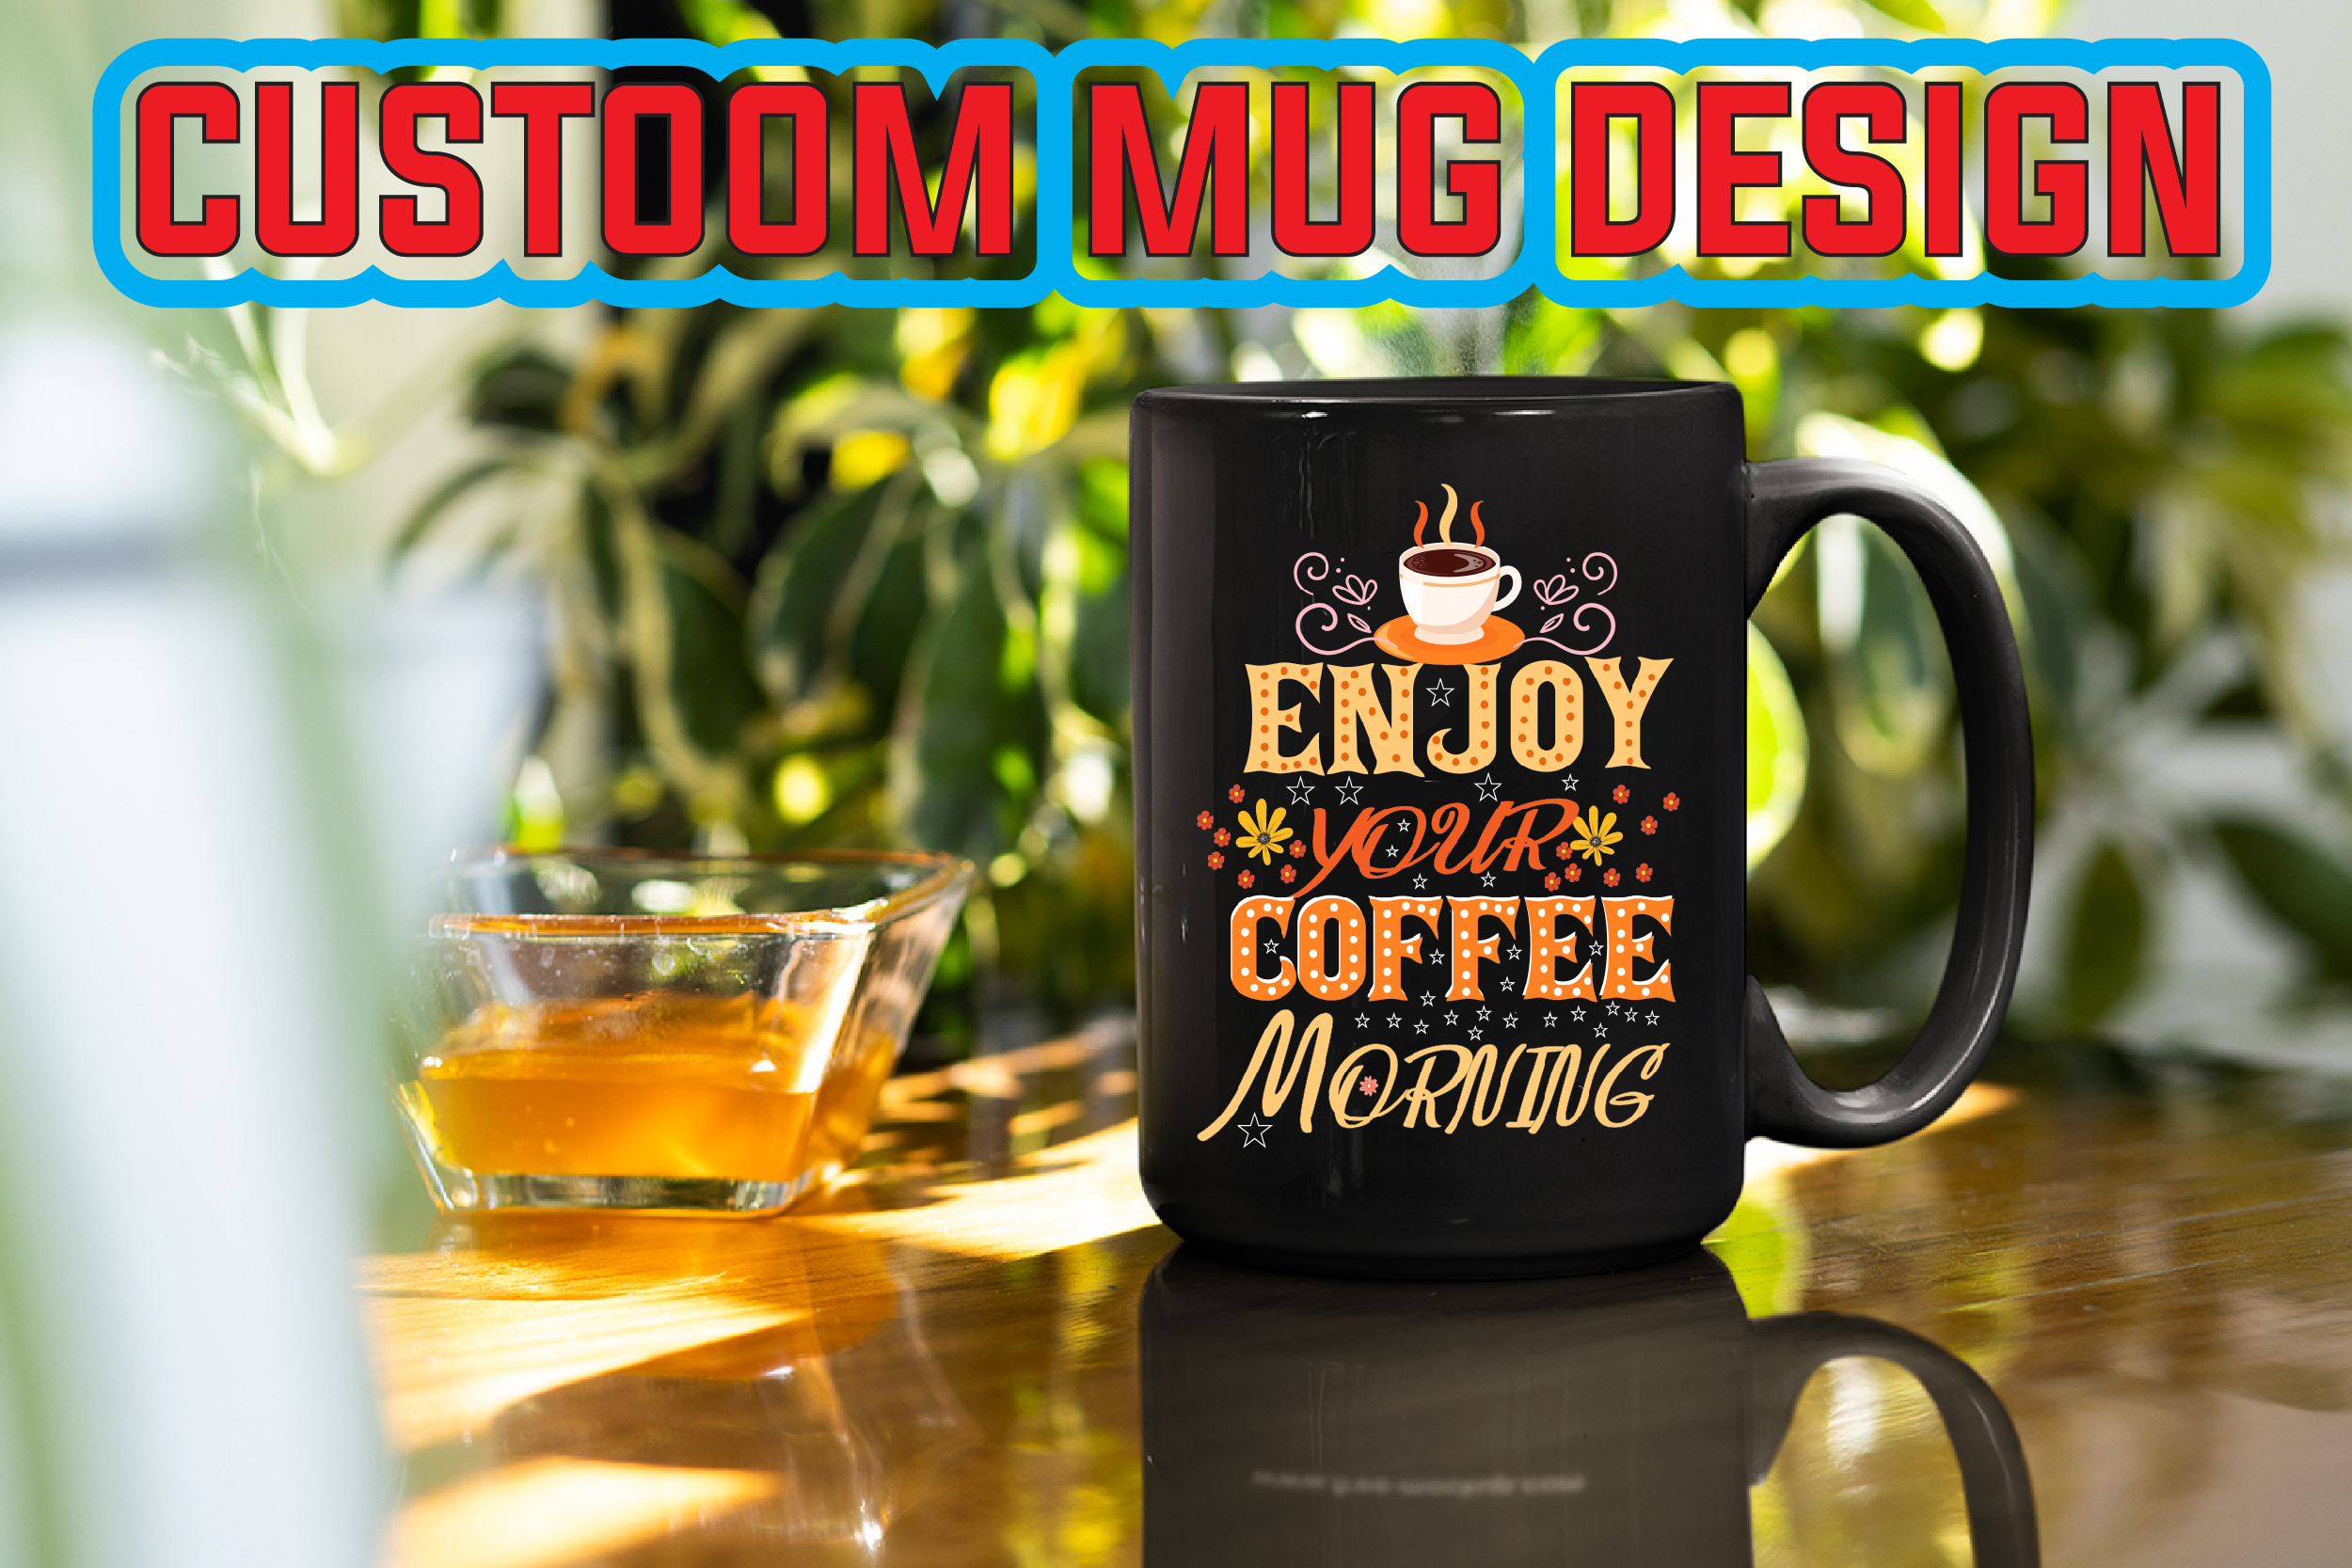 I will create cool coffee mug design 5 hours